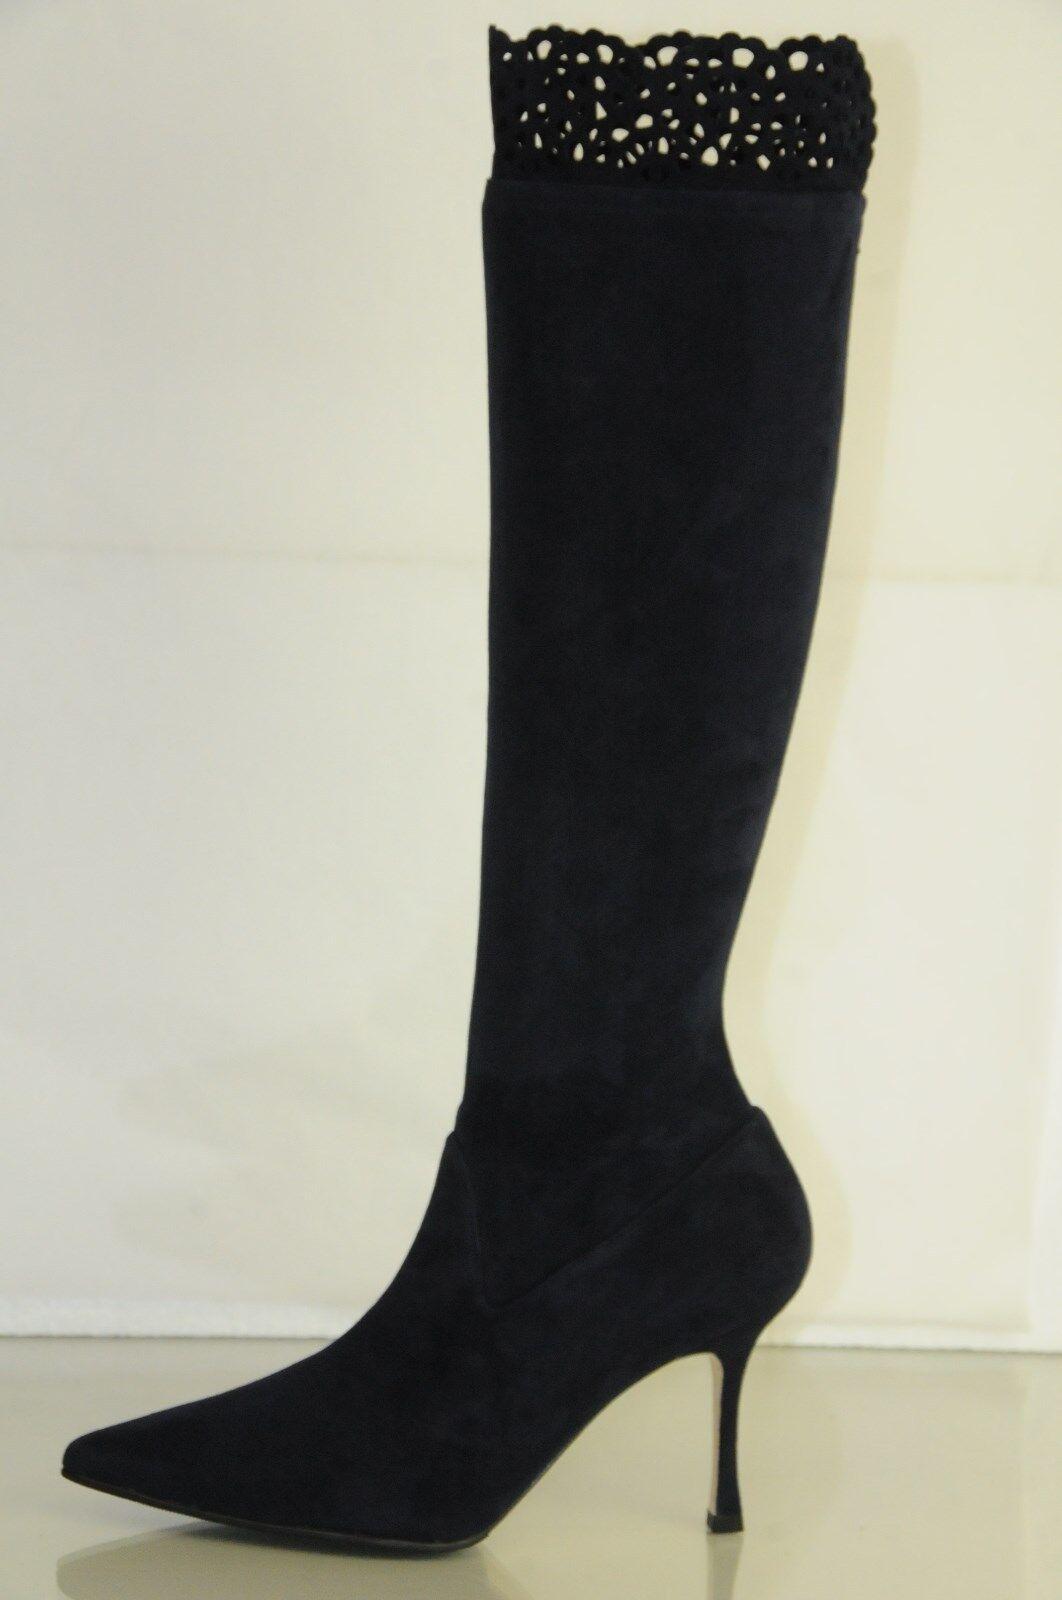 Neu Manolo Blahnik Pafatolo 90 Marine Wildleder Stretch Stiefel Schuhe 34.5 36.5